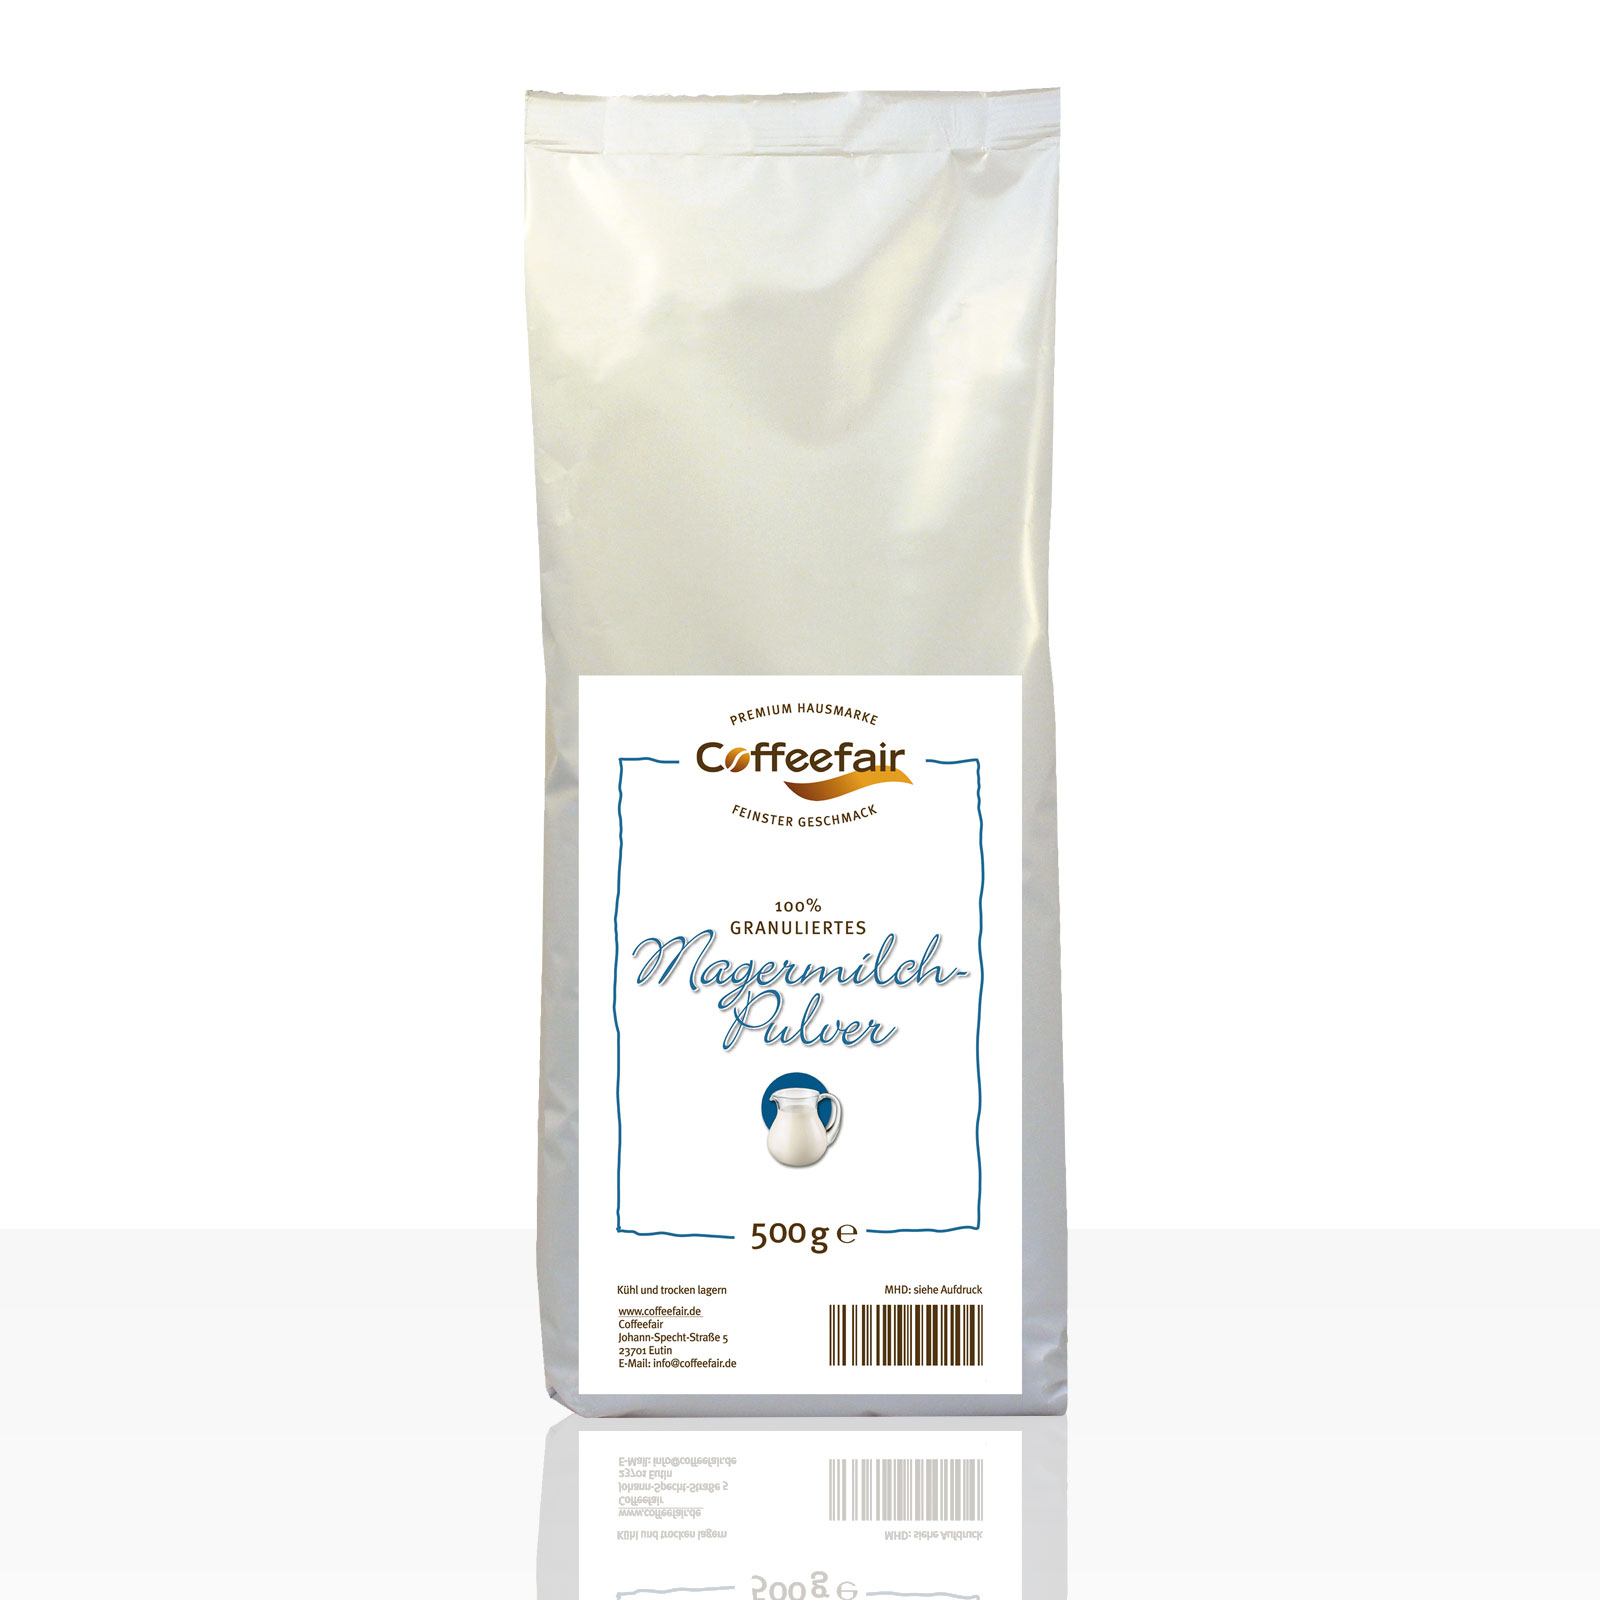 Coffeefair 100% granuliertes Magermilchpulver